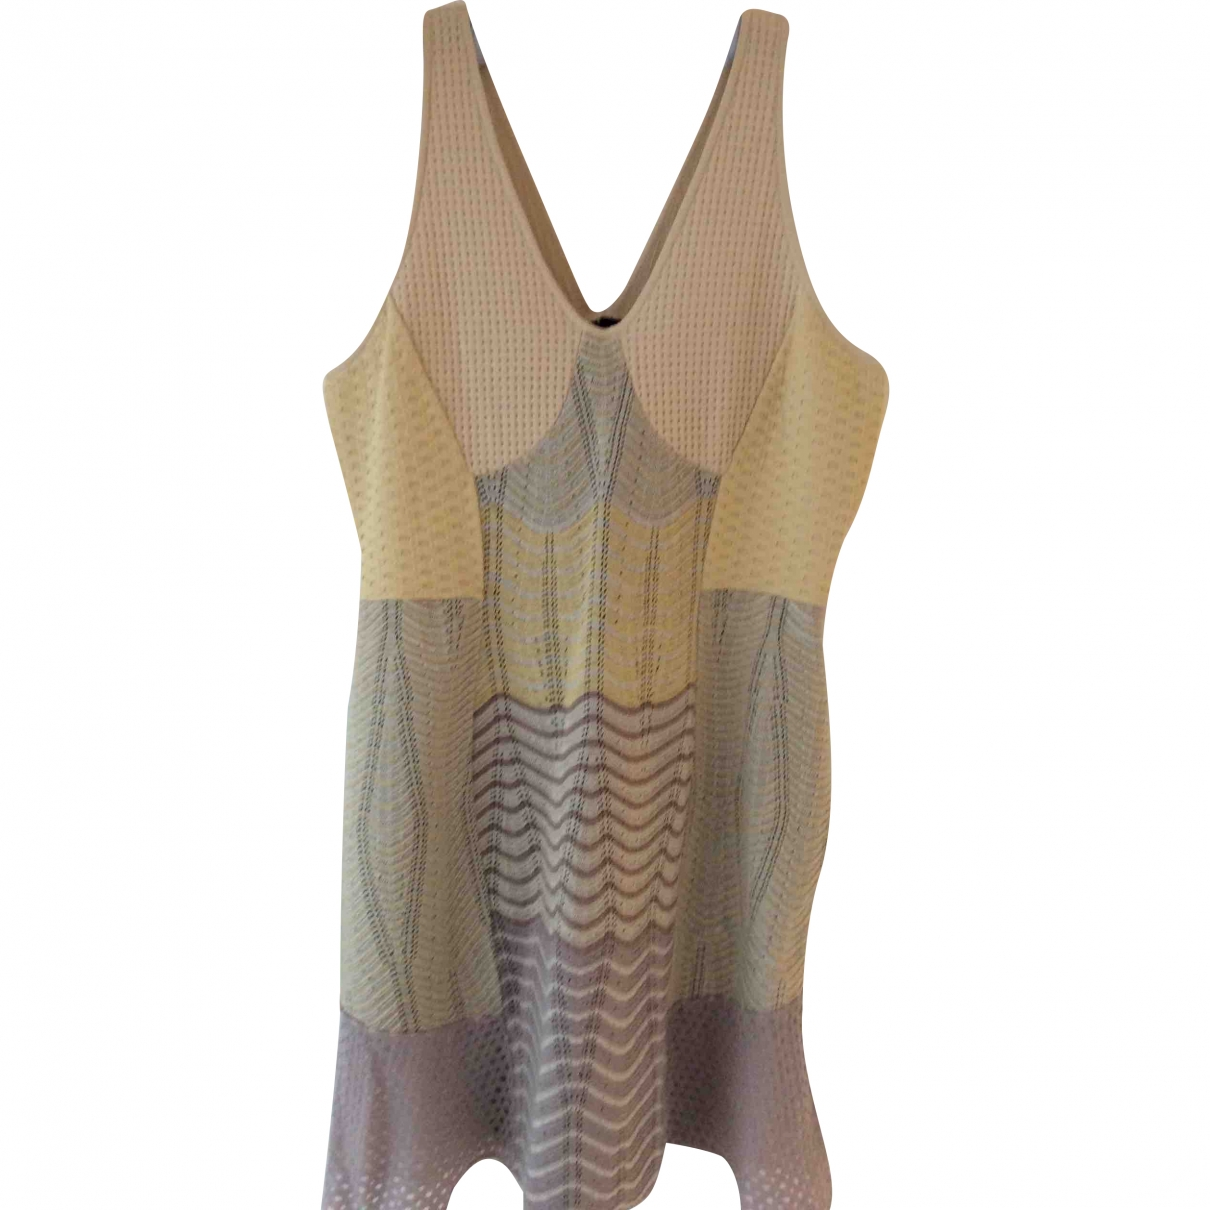 M Missoni \N Beige Cotton - elasthane dress for Women 46 IT